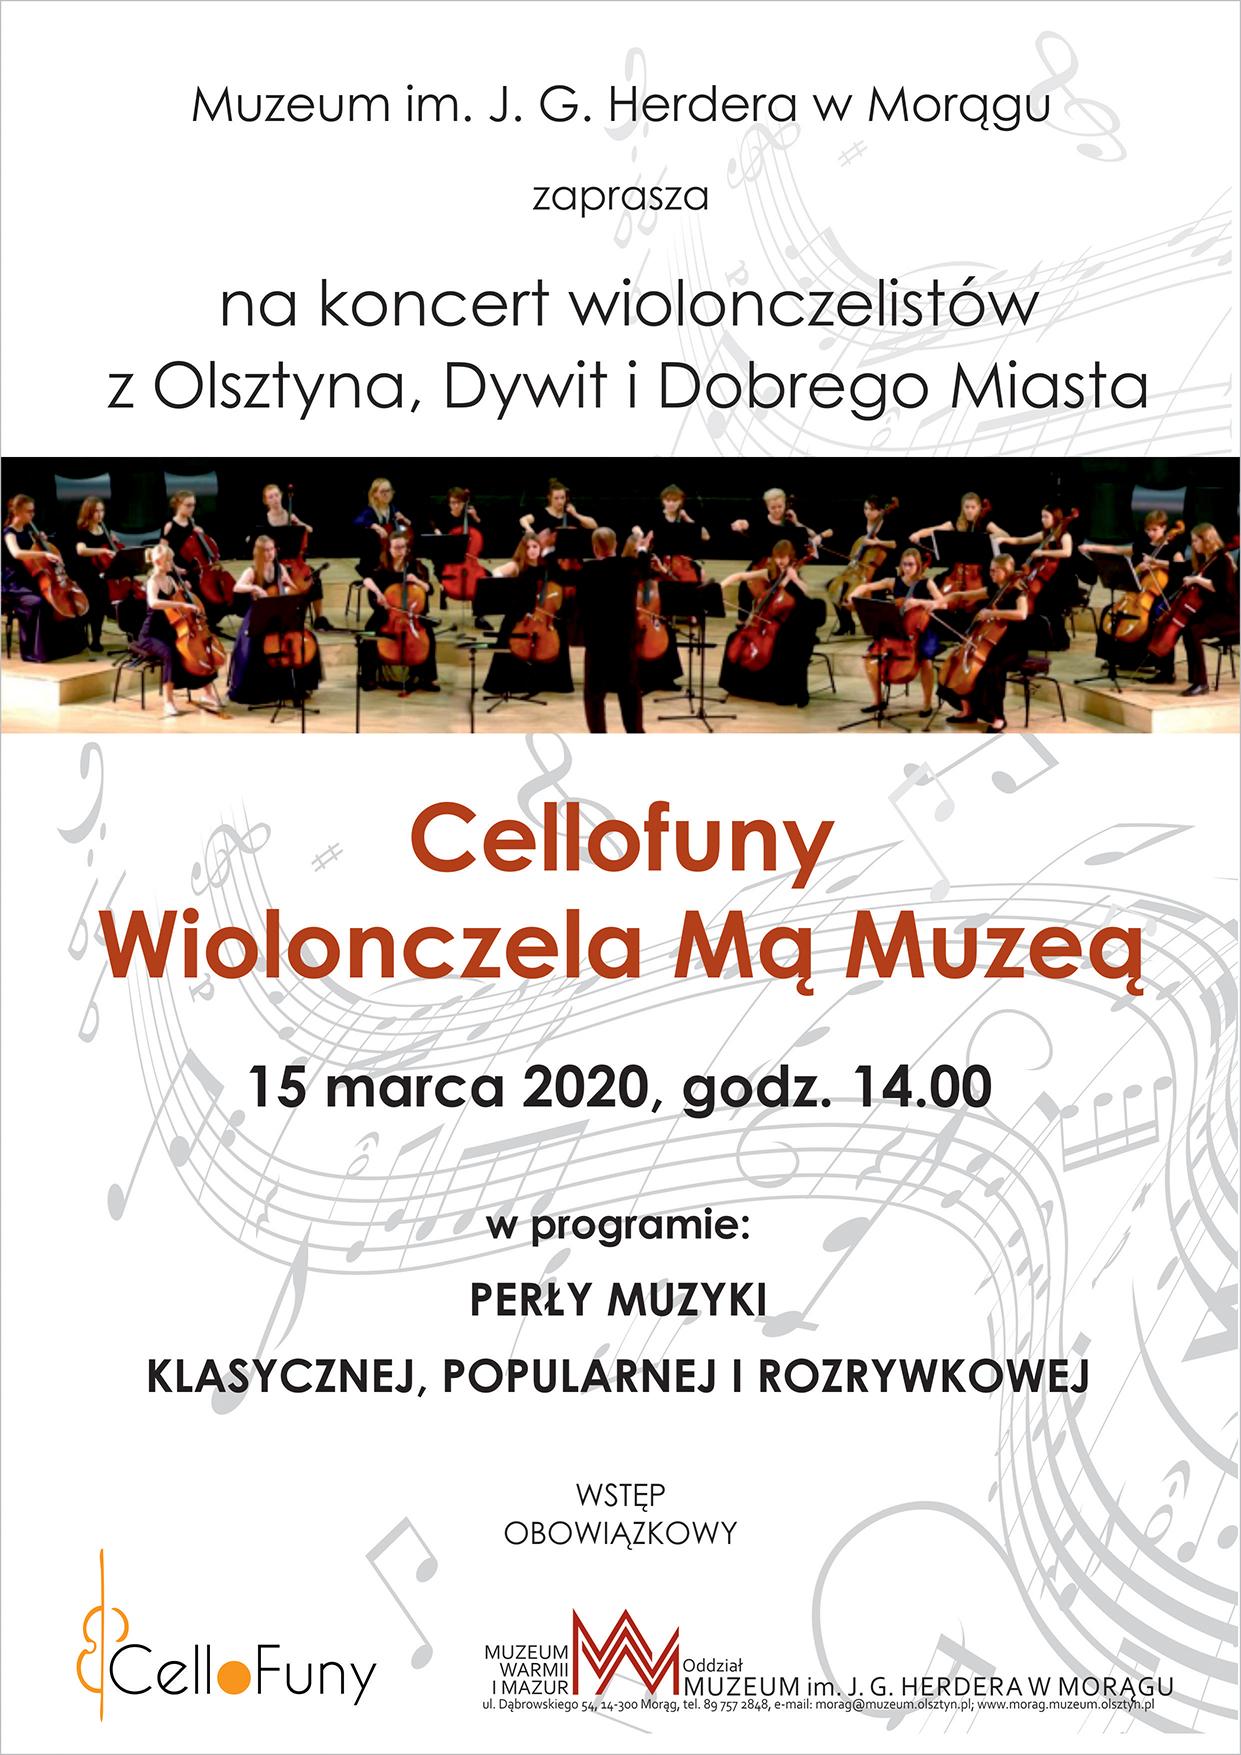 https://m.wmwm.pl/2020/02/orig/cello-int-6616.jpg